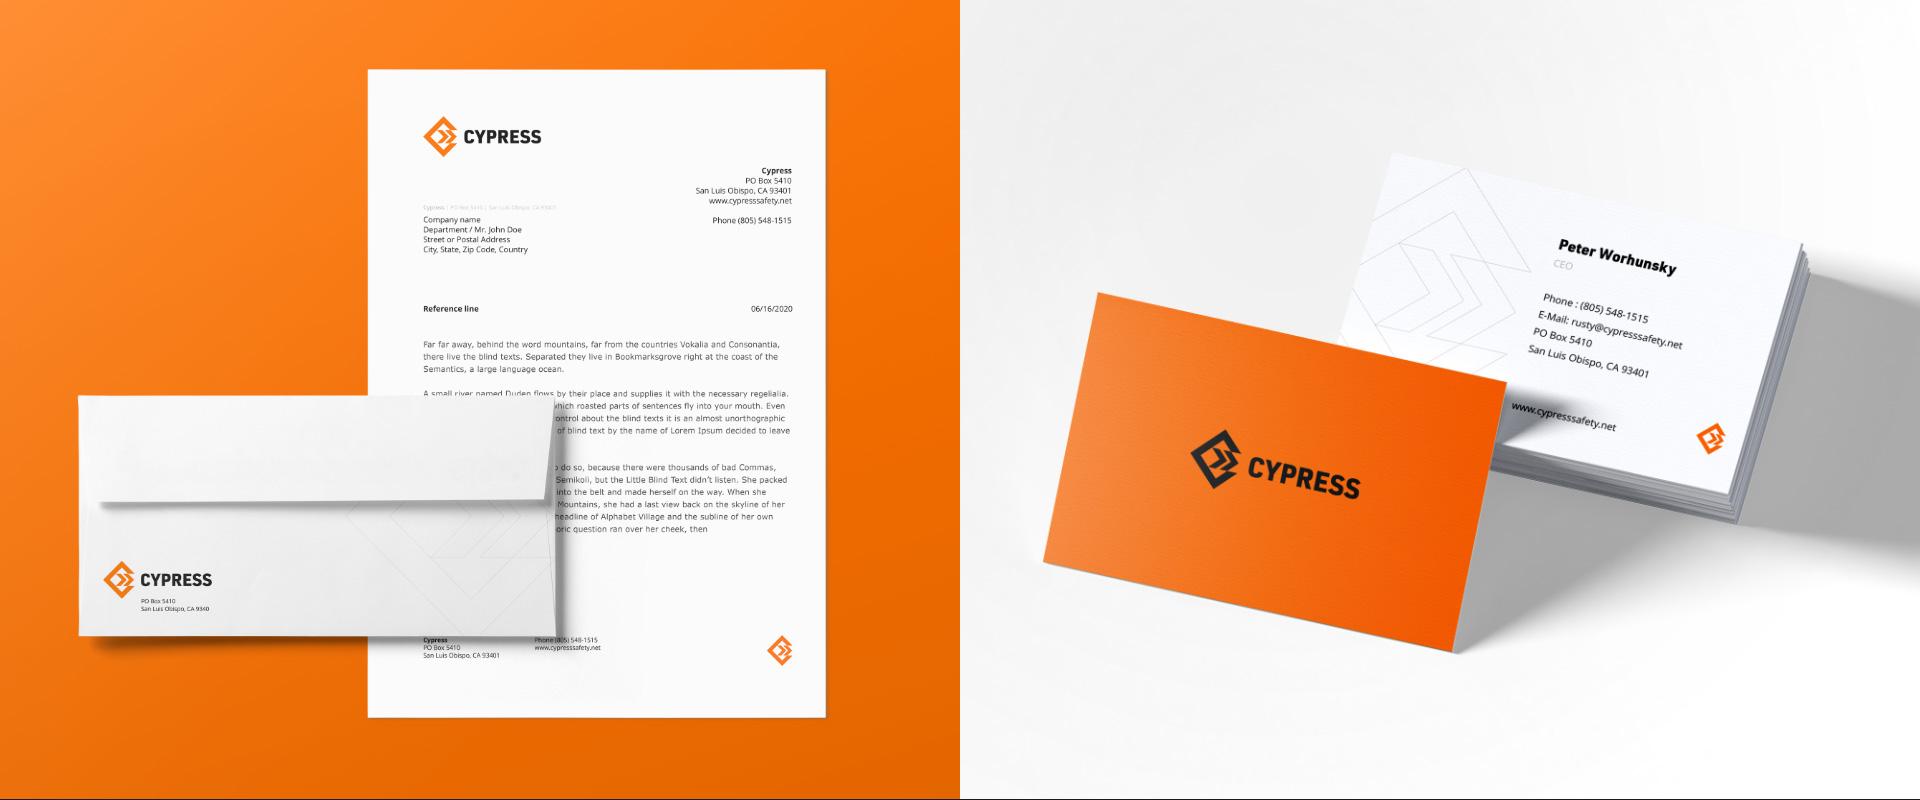 Cypress Safety - Stationary